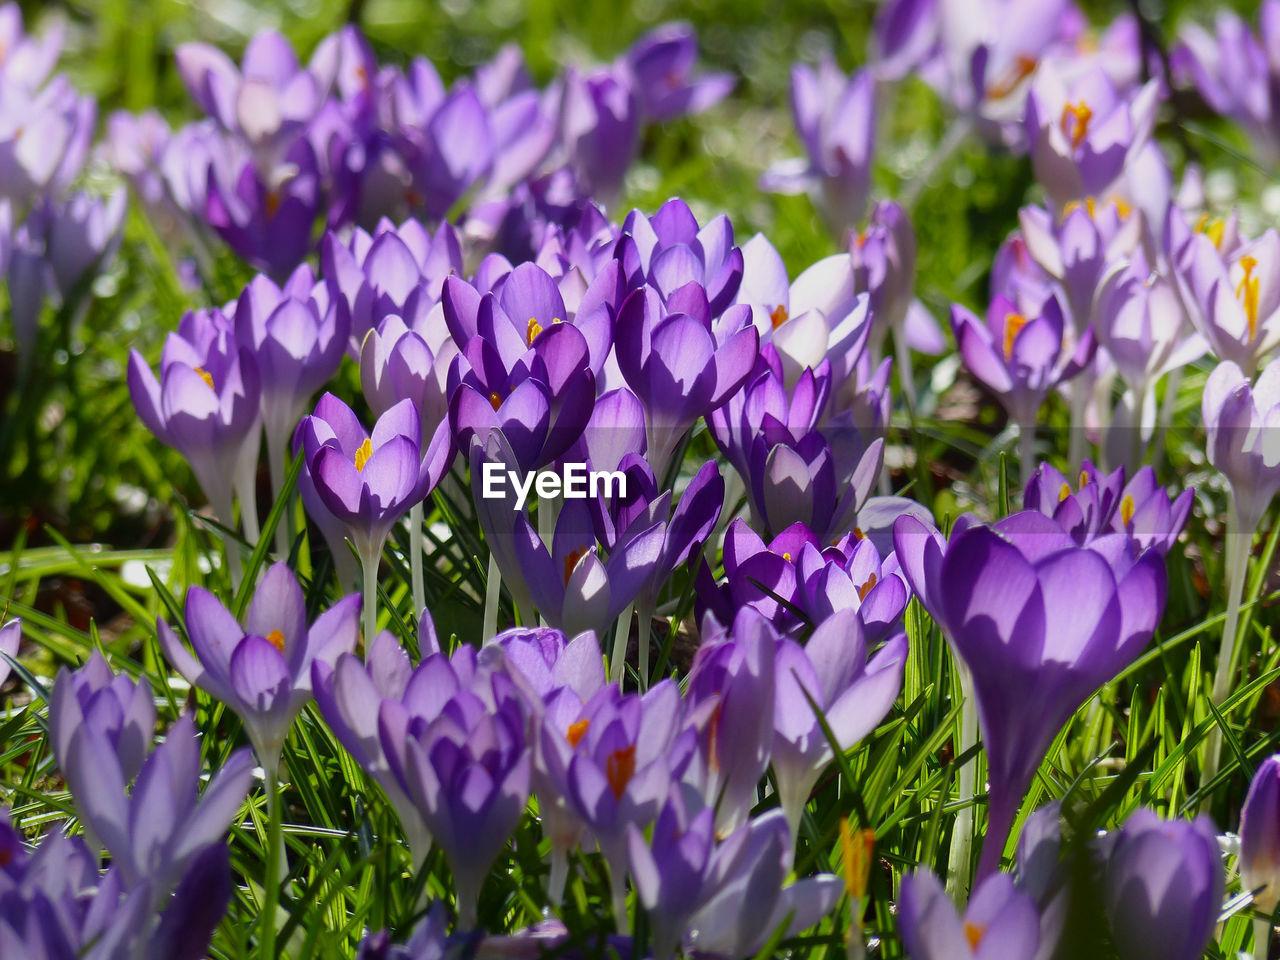 CLOSE-UP OF PURPLE CROCUS FLOWERS GROWING ON FIELD